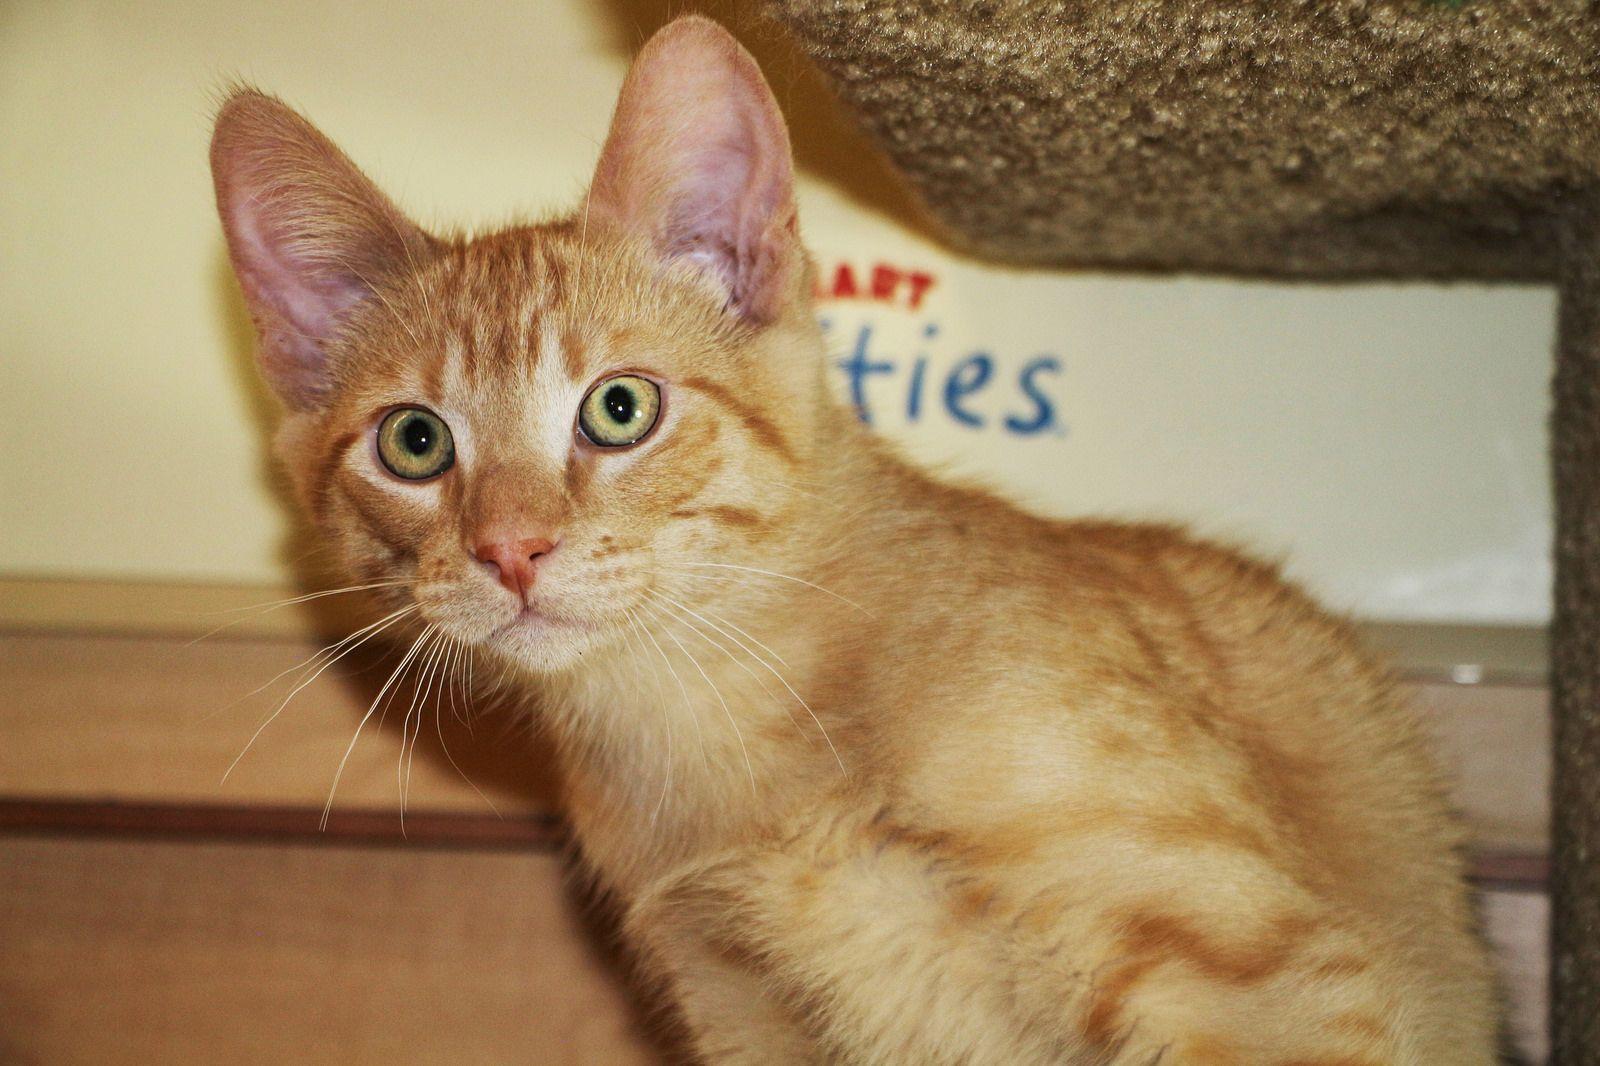 Punkin Scat Petsmart Adoption Centre June 6 2016 Cat Adoption Adoption Center Cat Photo